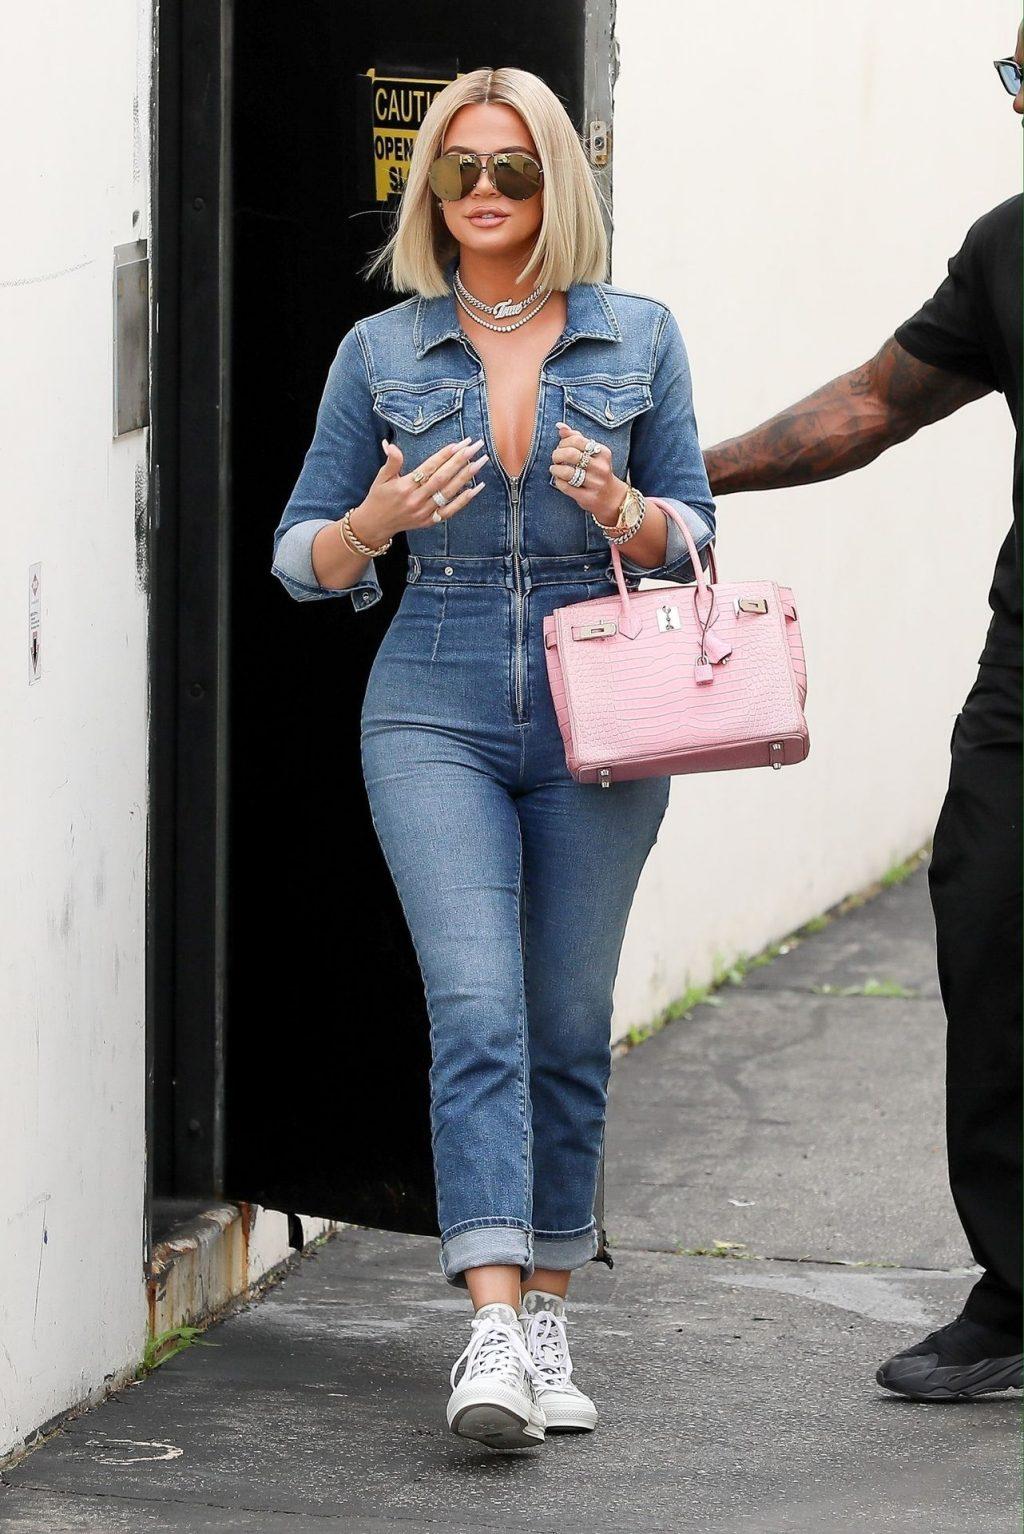 Denim Babe Khloe Kardashian Leaves the Studio in a Jean Jumpsuit (18 Photos)